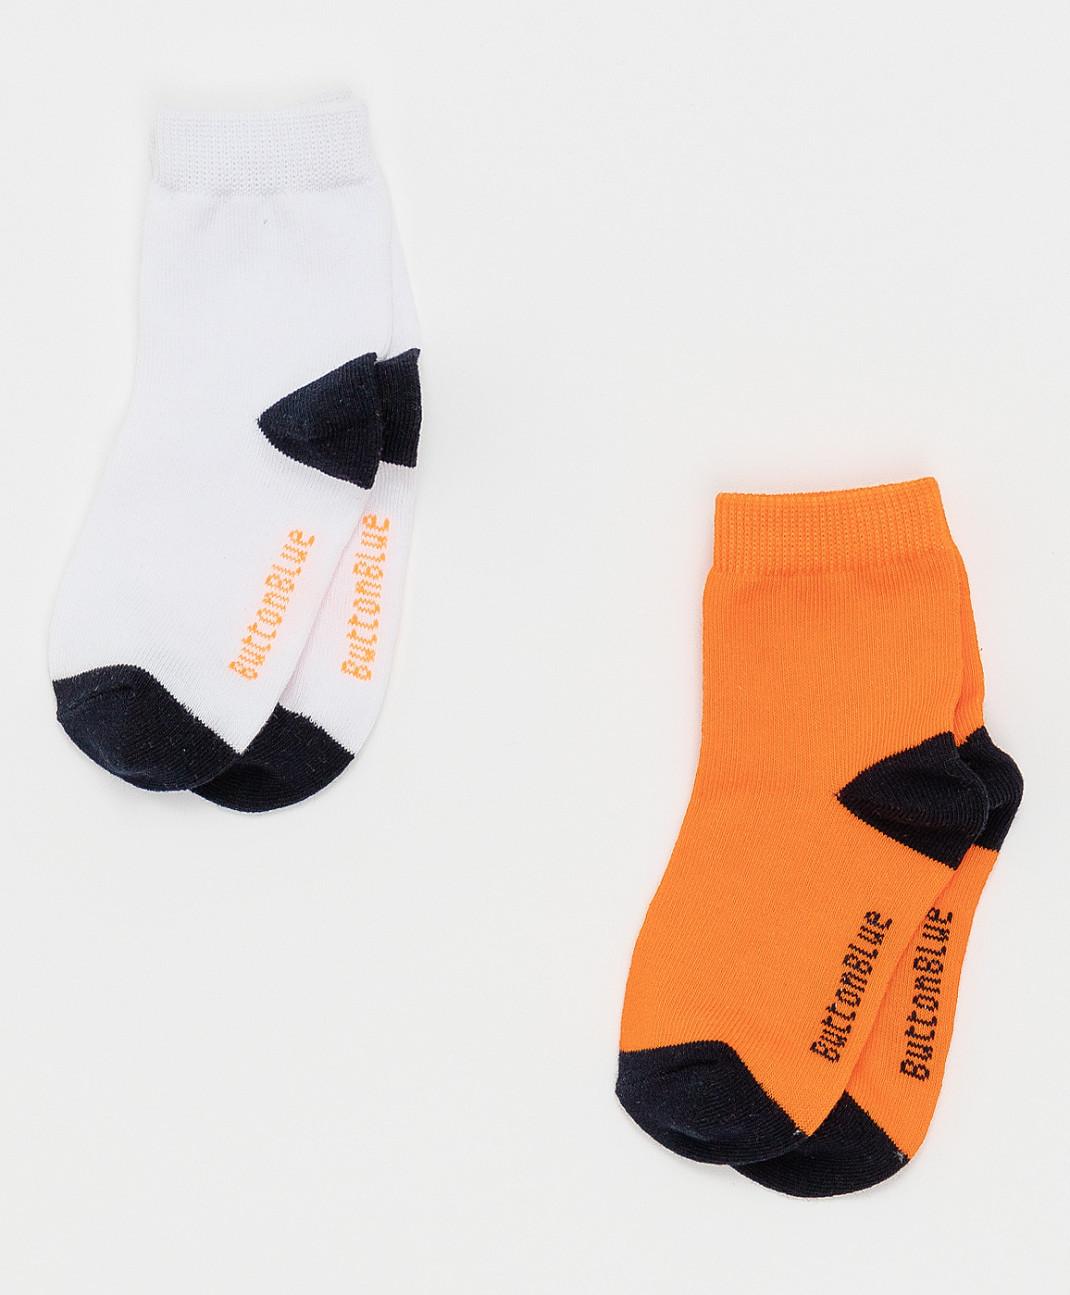 Button Blue Оранжевые носки Button Blue